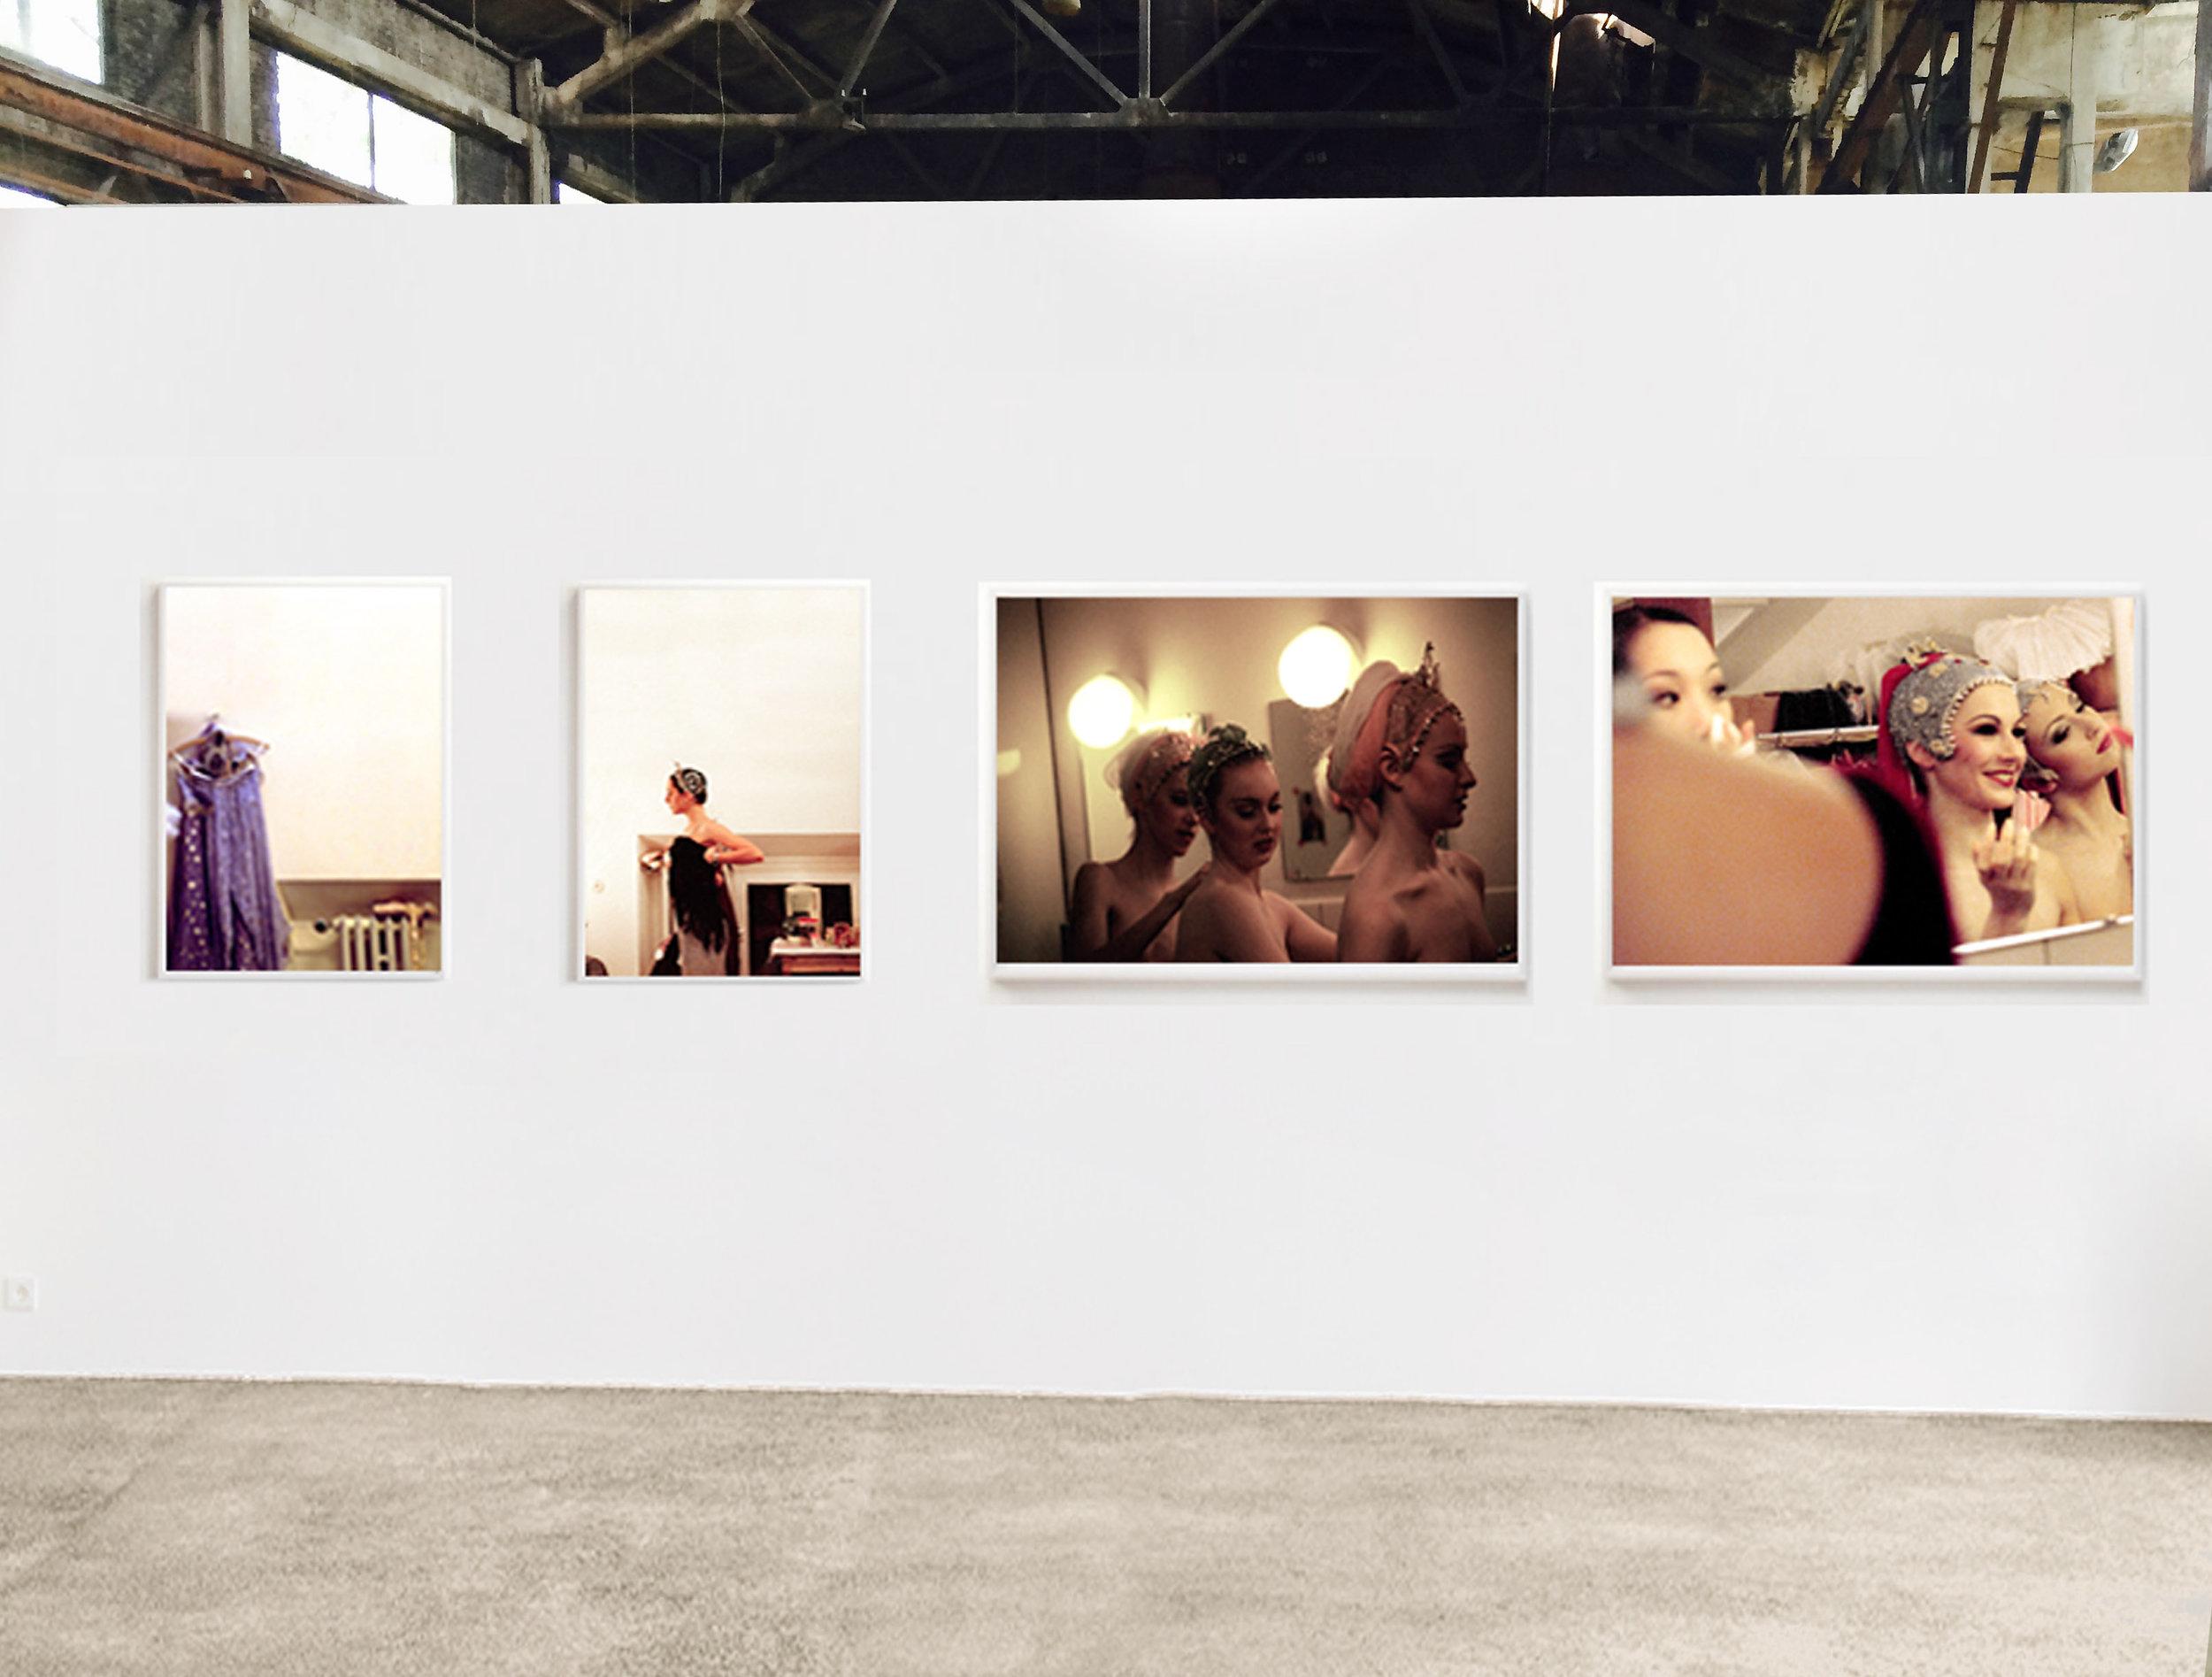 14th Pingyao International Photography Festival Pingyao, China, 2014 curated by Thomas Kellner